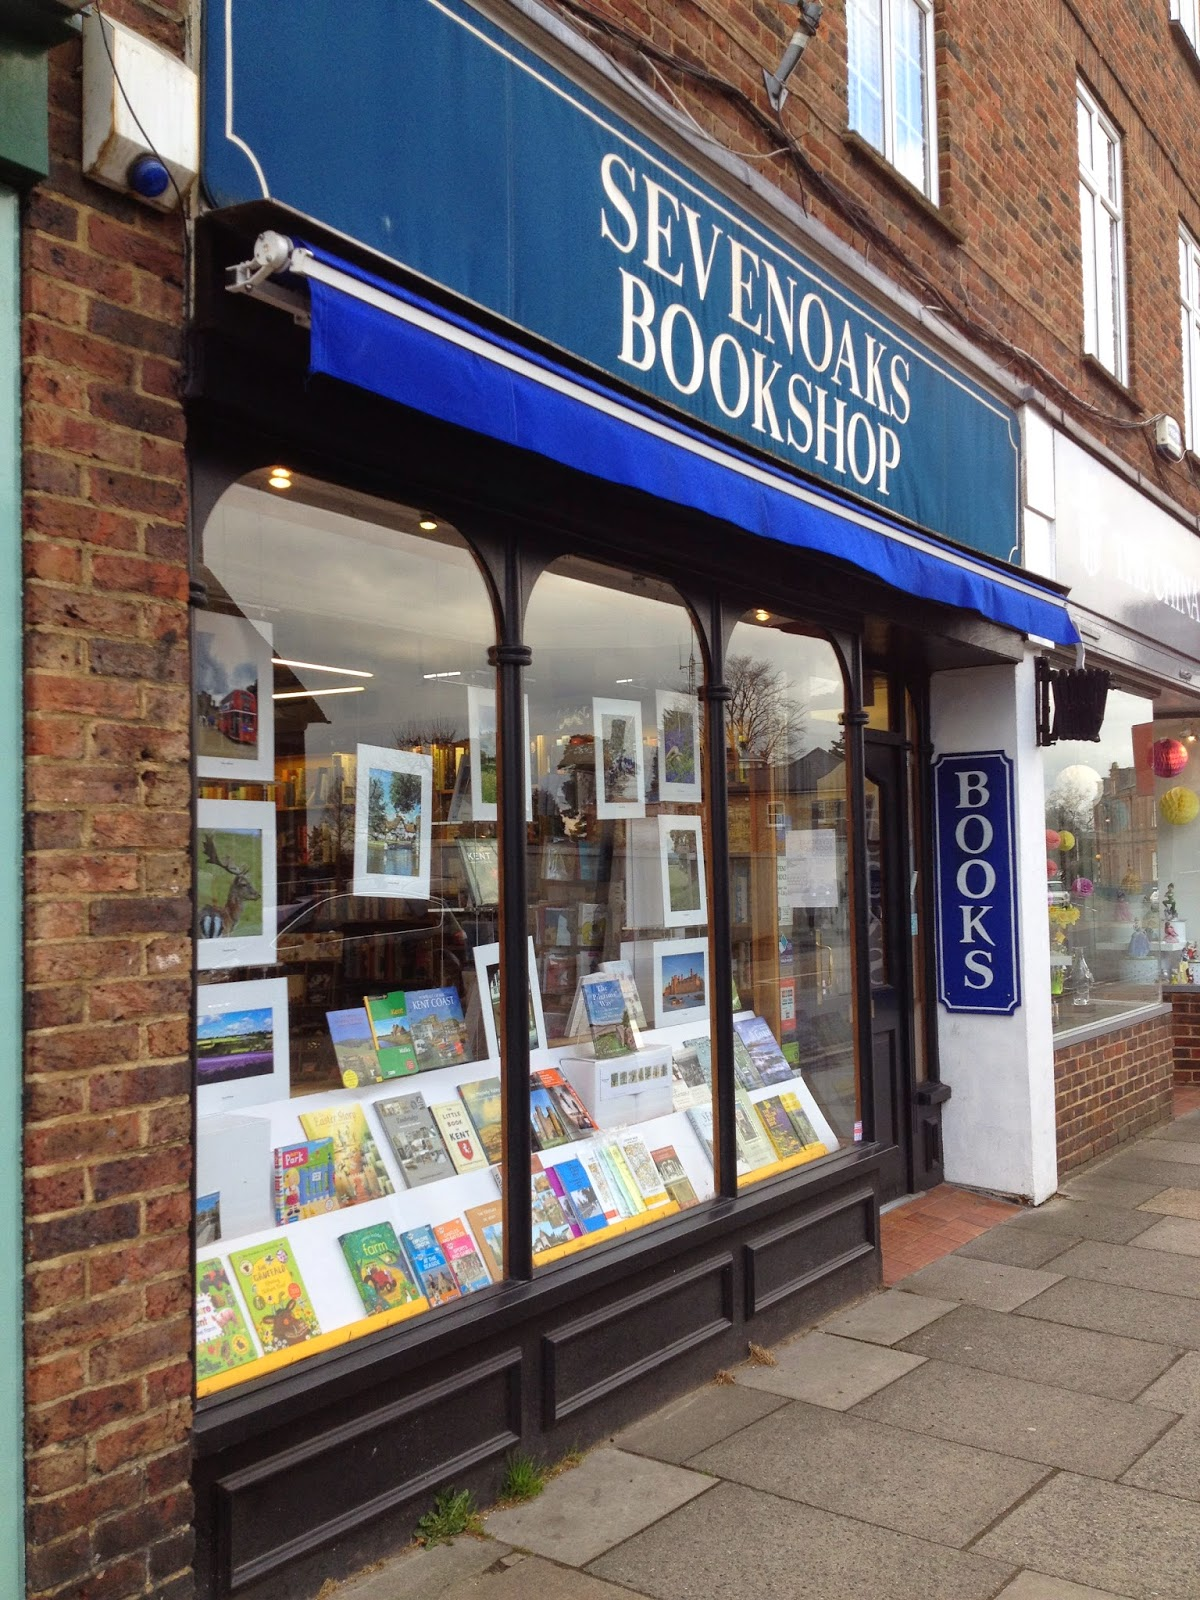 Image result for the sevenoaks bookshop